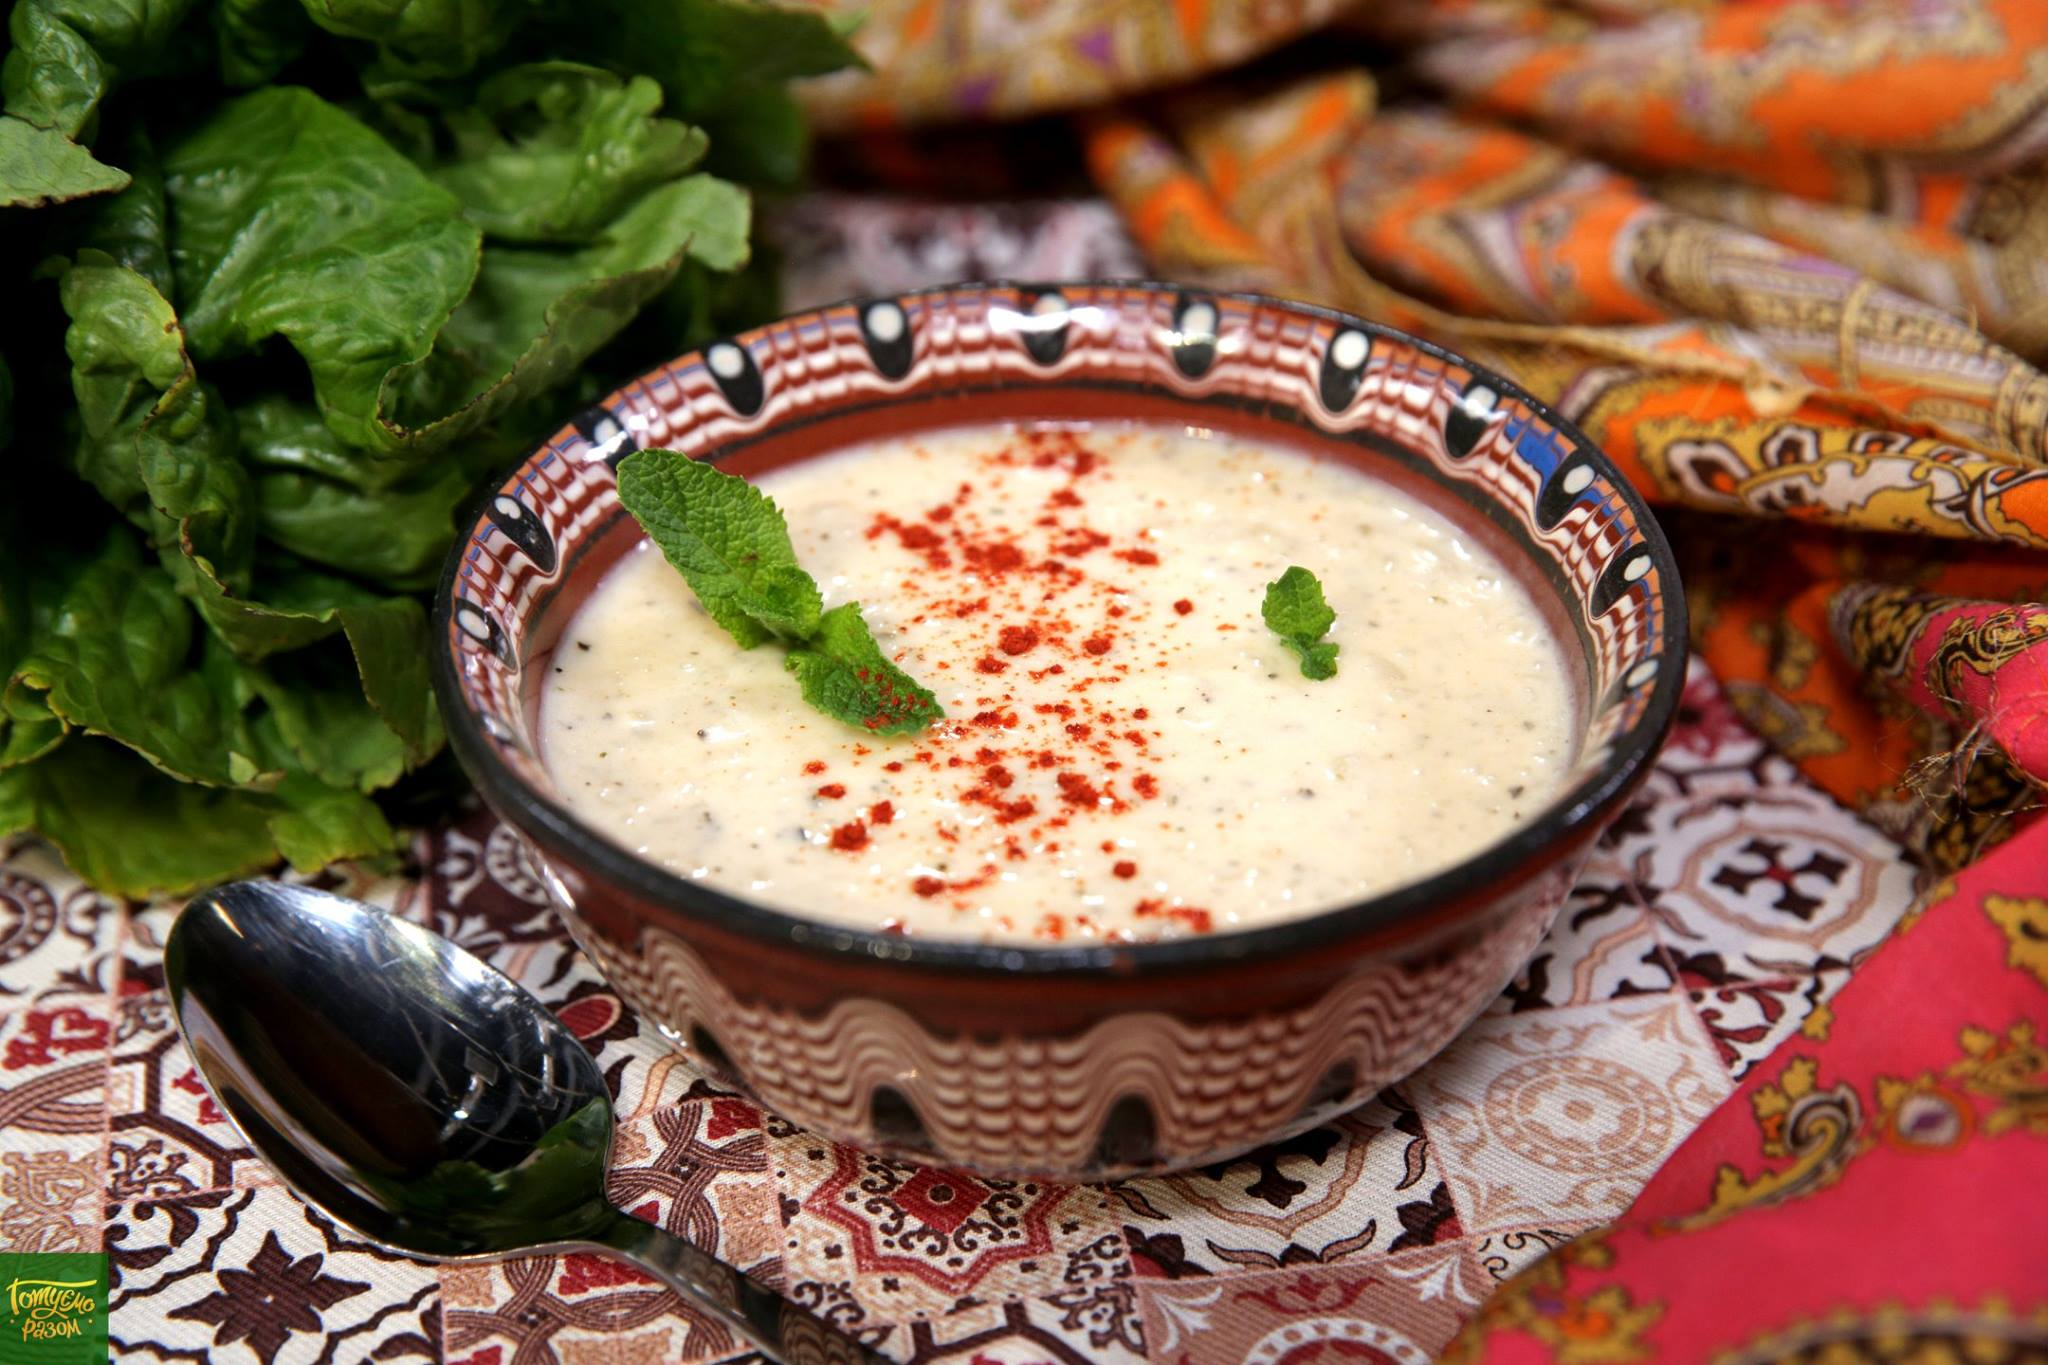 Турецкий йогуртовый суп Яйла Чорбасы (Yayla çorbası)